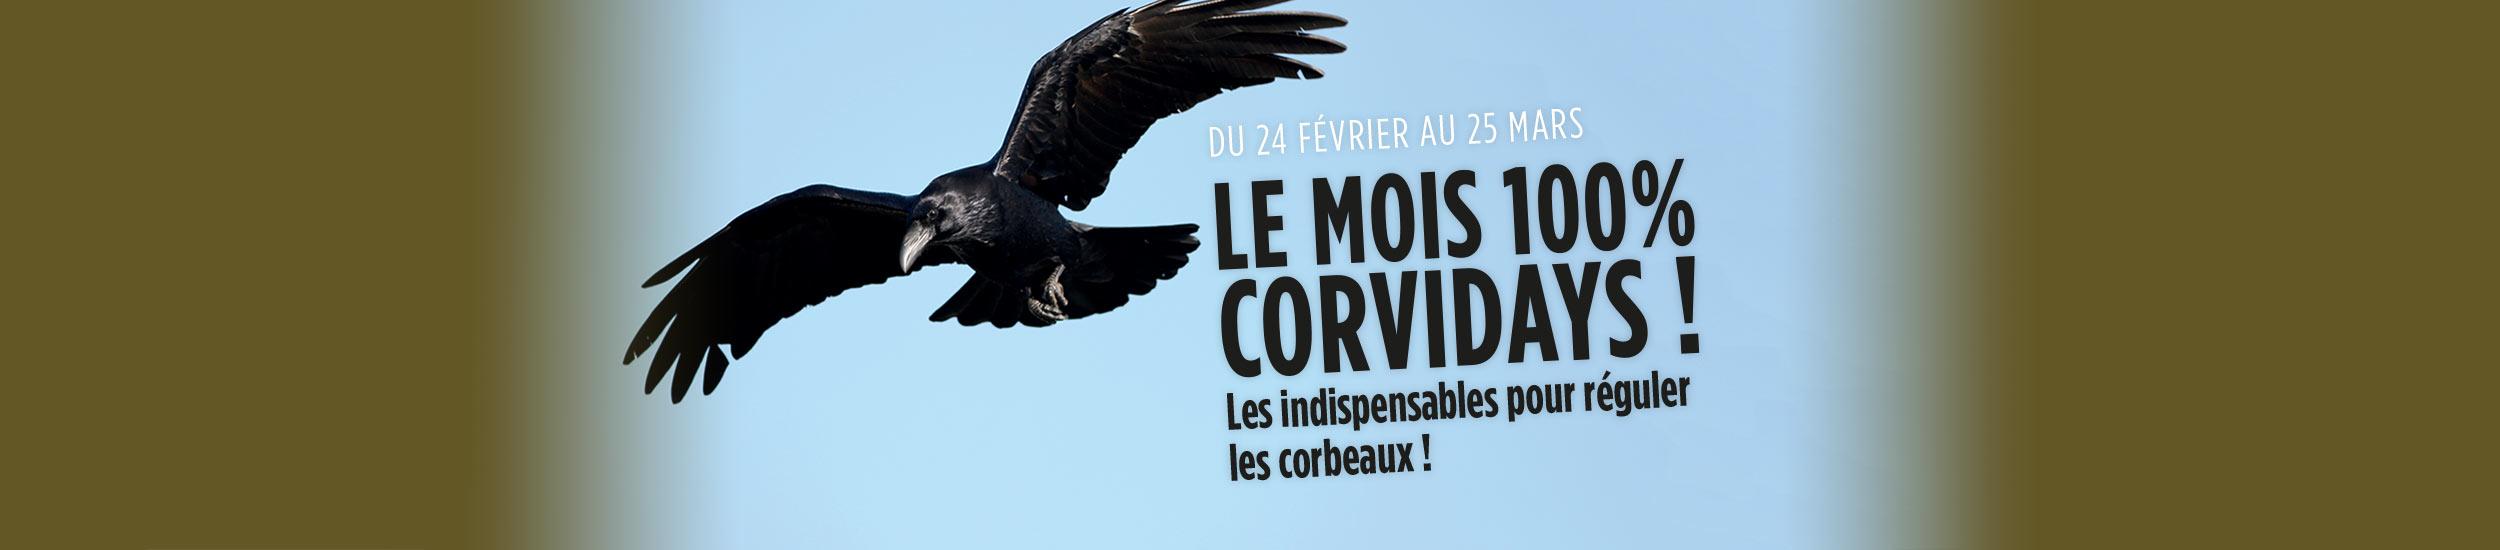 LE MOIS 100% CORVIDAYS !